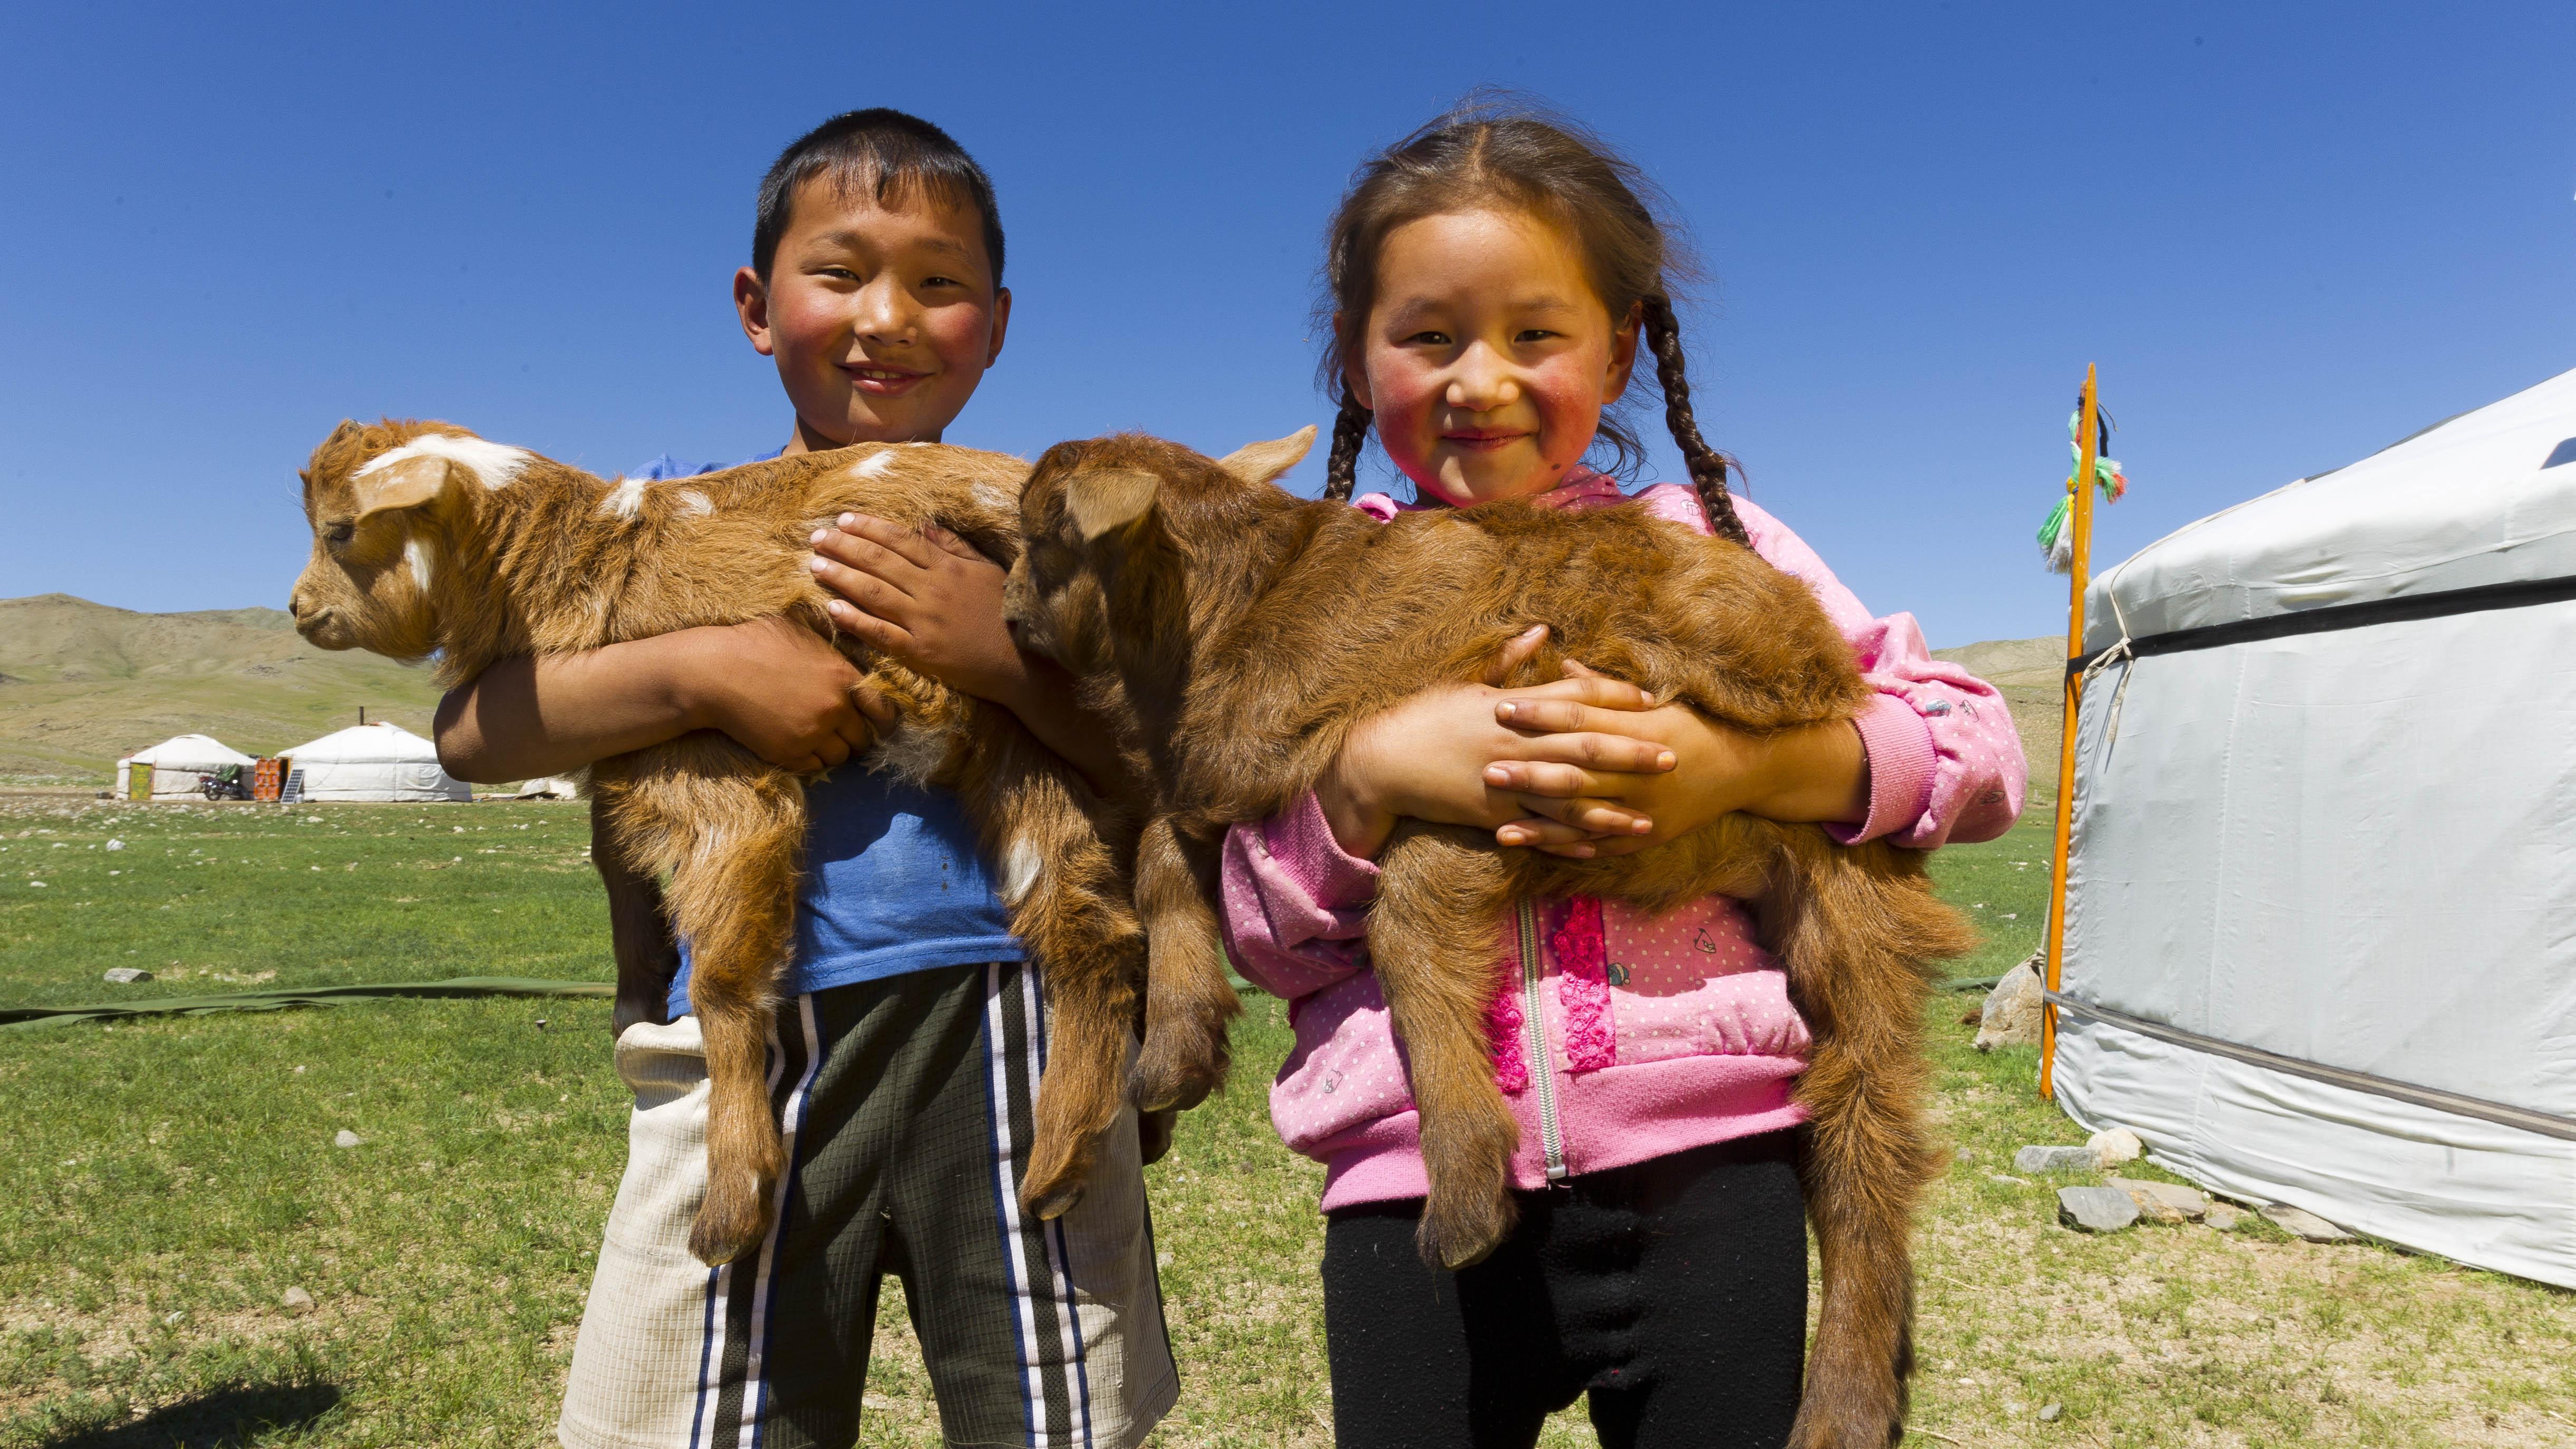 Demographics of mongolia horseback mongolia for Cheb hichem 2015 la piscine